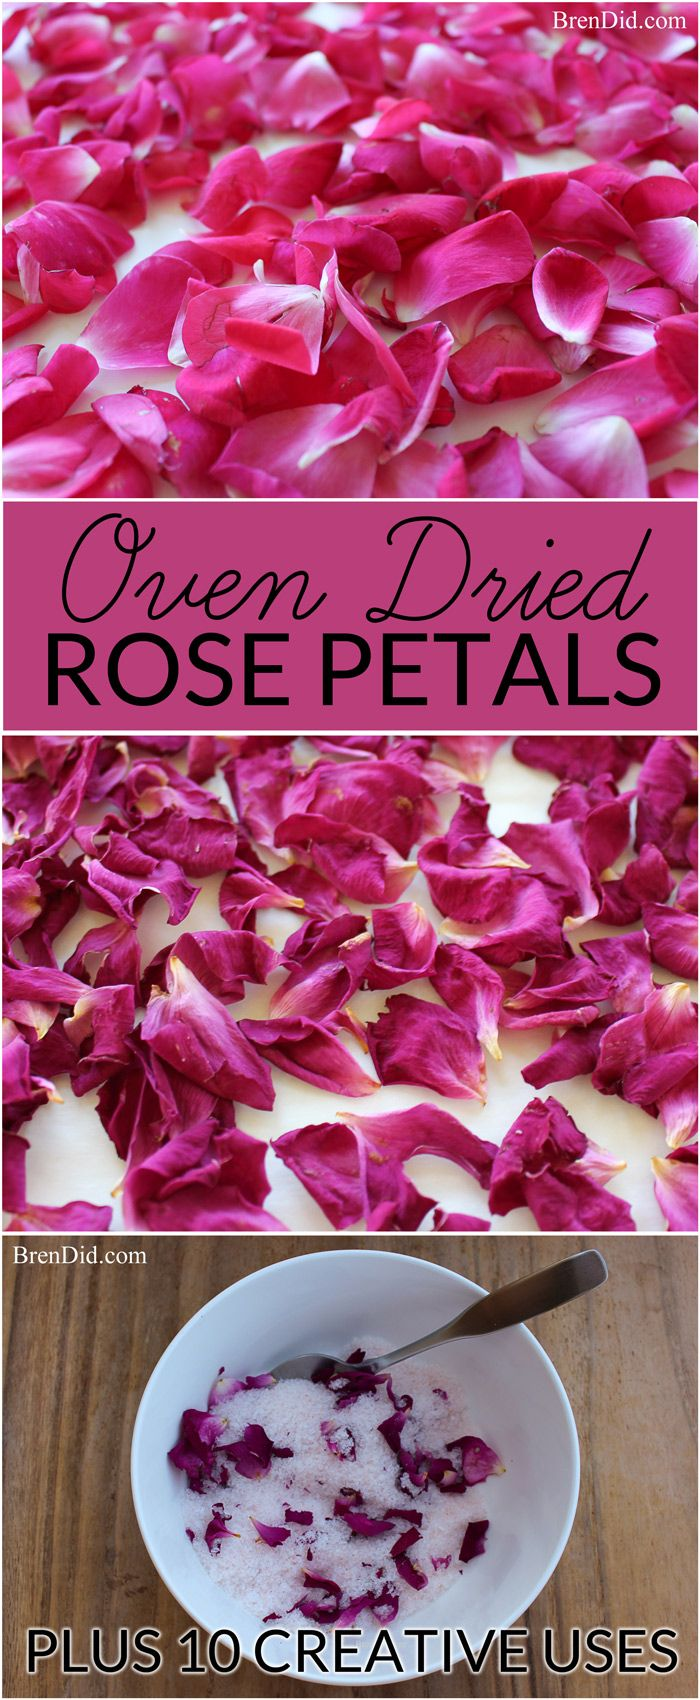 Dried rose petal chinese rose flower rose tea buy rose petal - How To Oven Dry Rose Petals